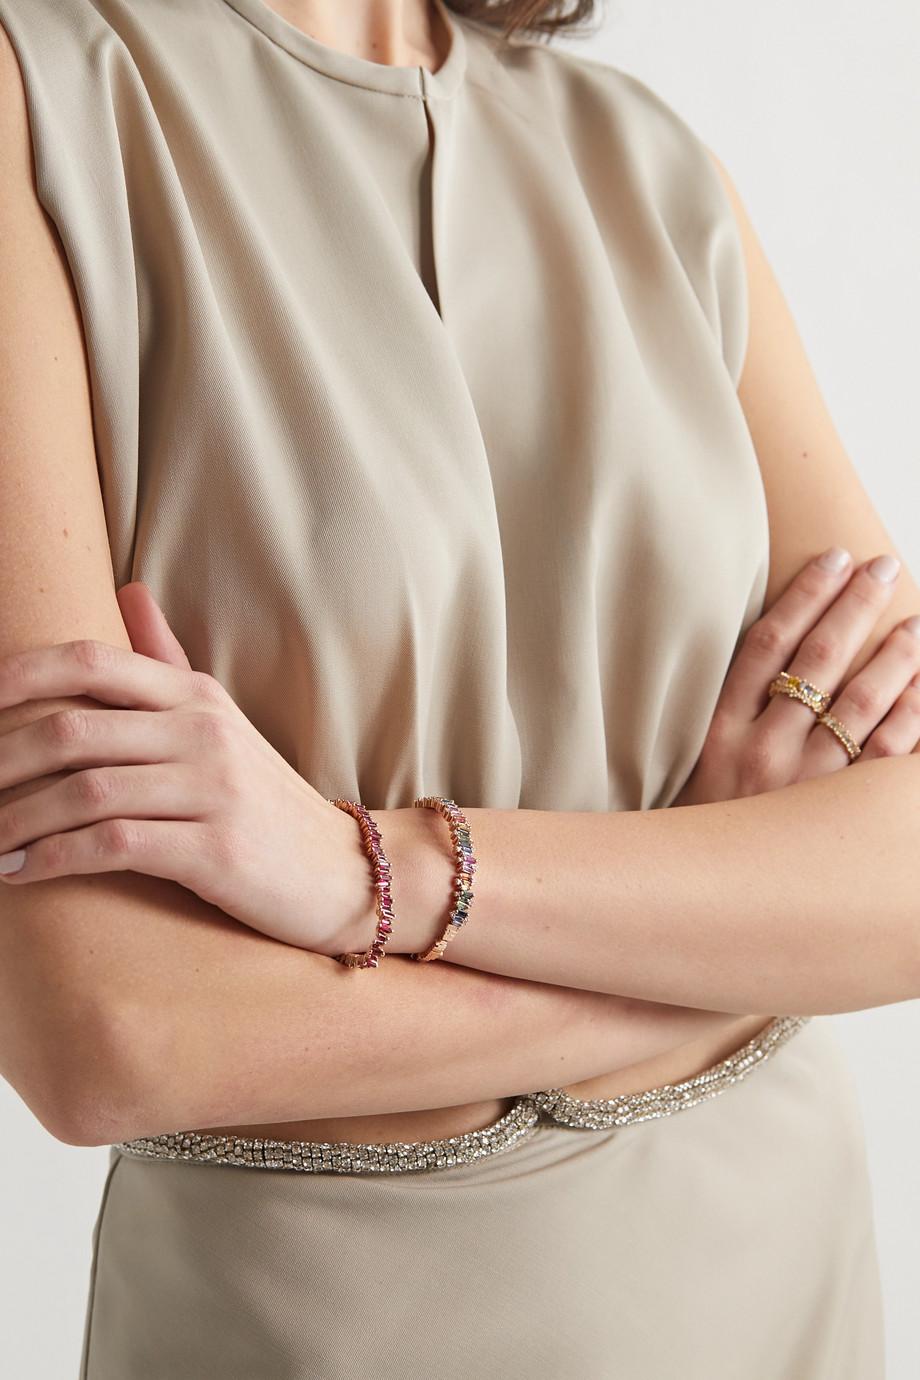 Suzanne Kalan 18-karat rose gold ruby bracelet